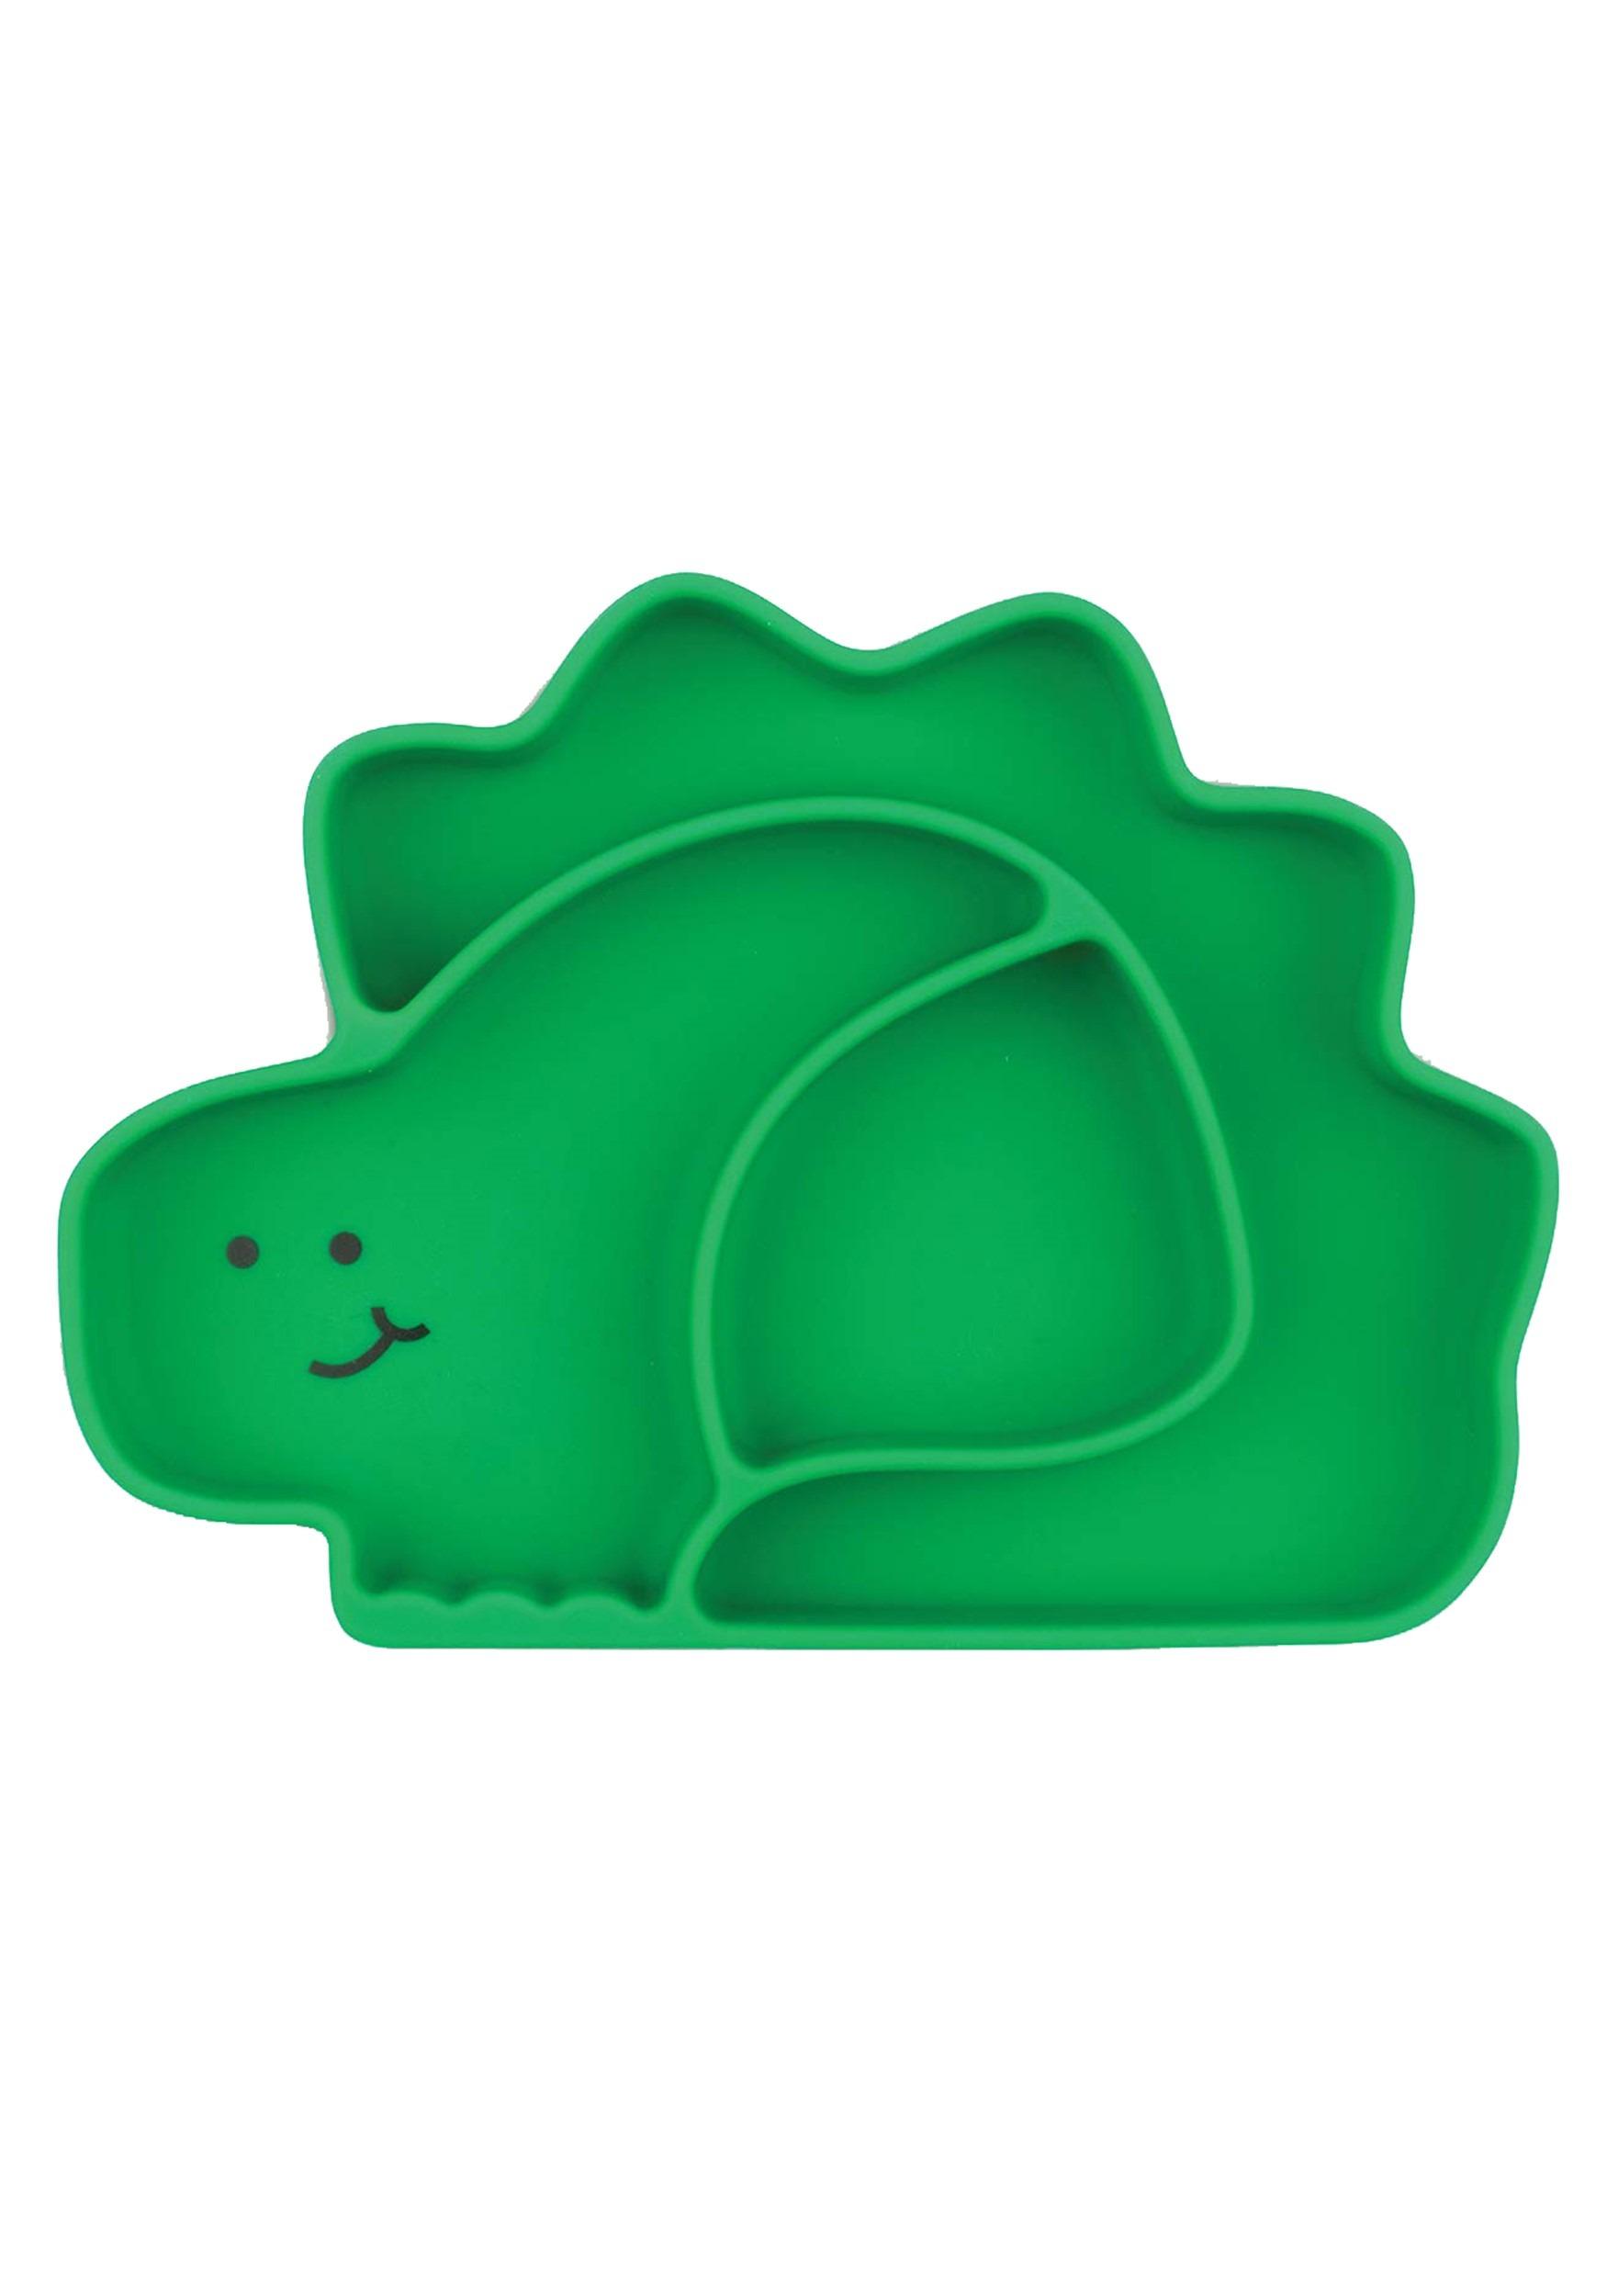 Green Dinosaur Silicone Grip Dish